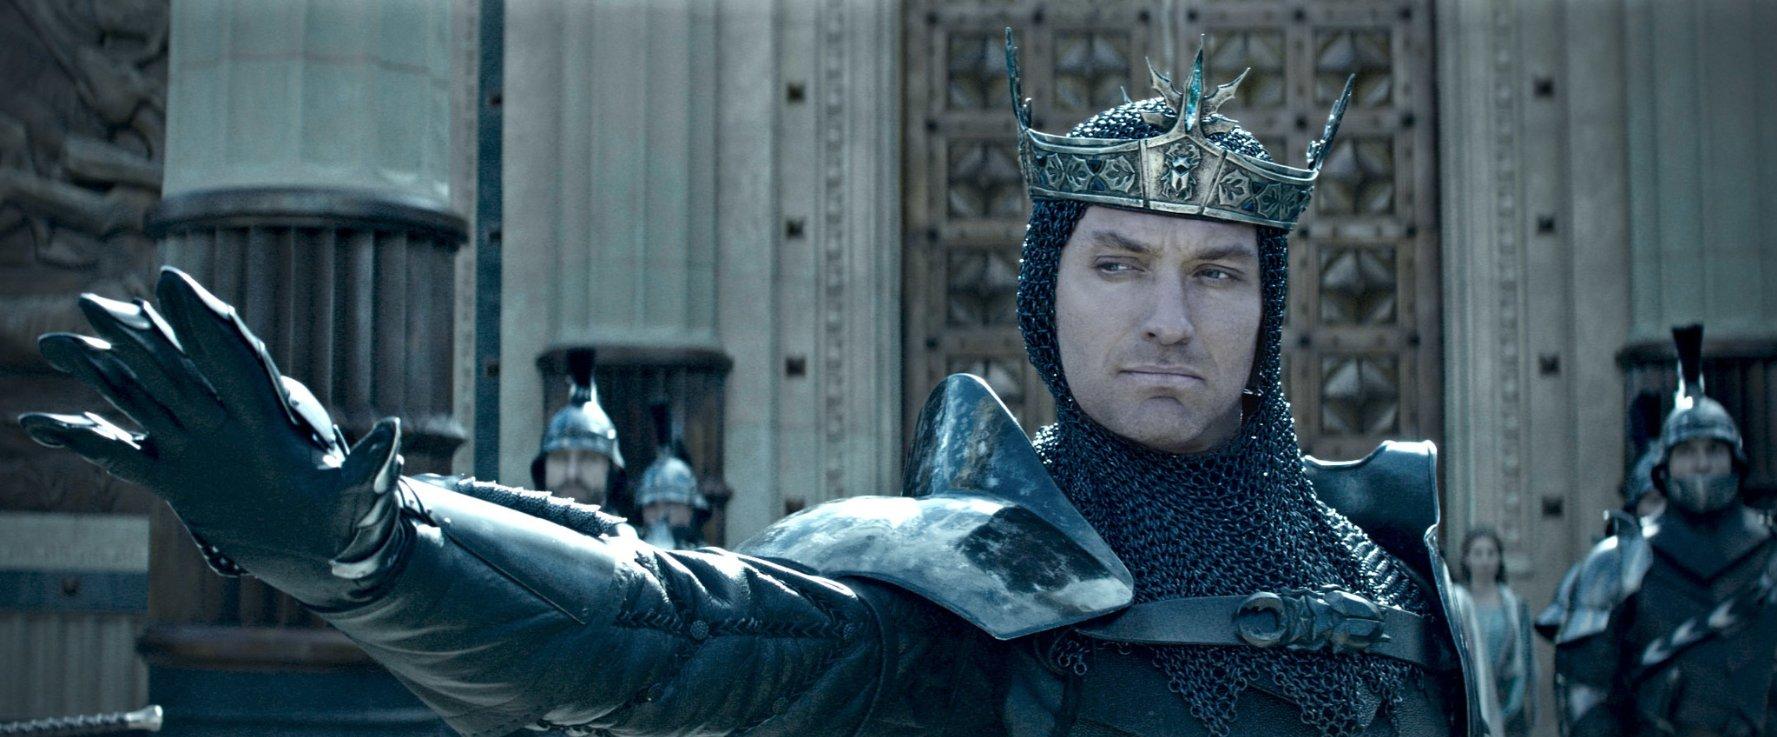 Jude Law in King Arthur: Legend of the Sword